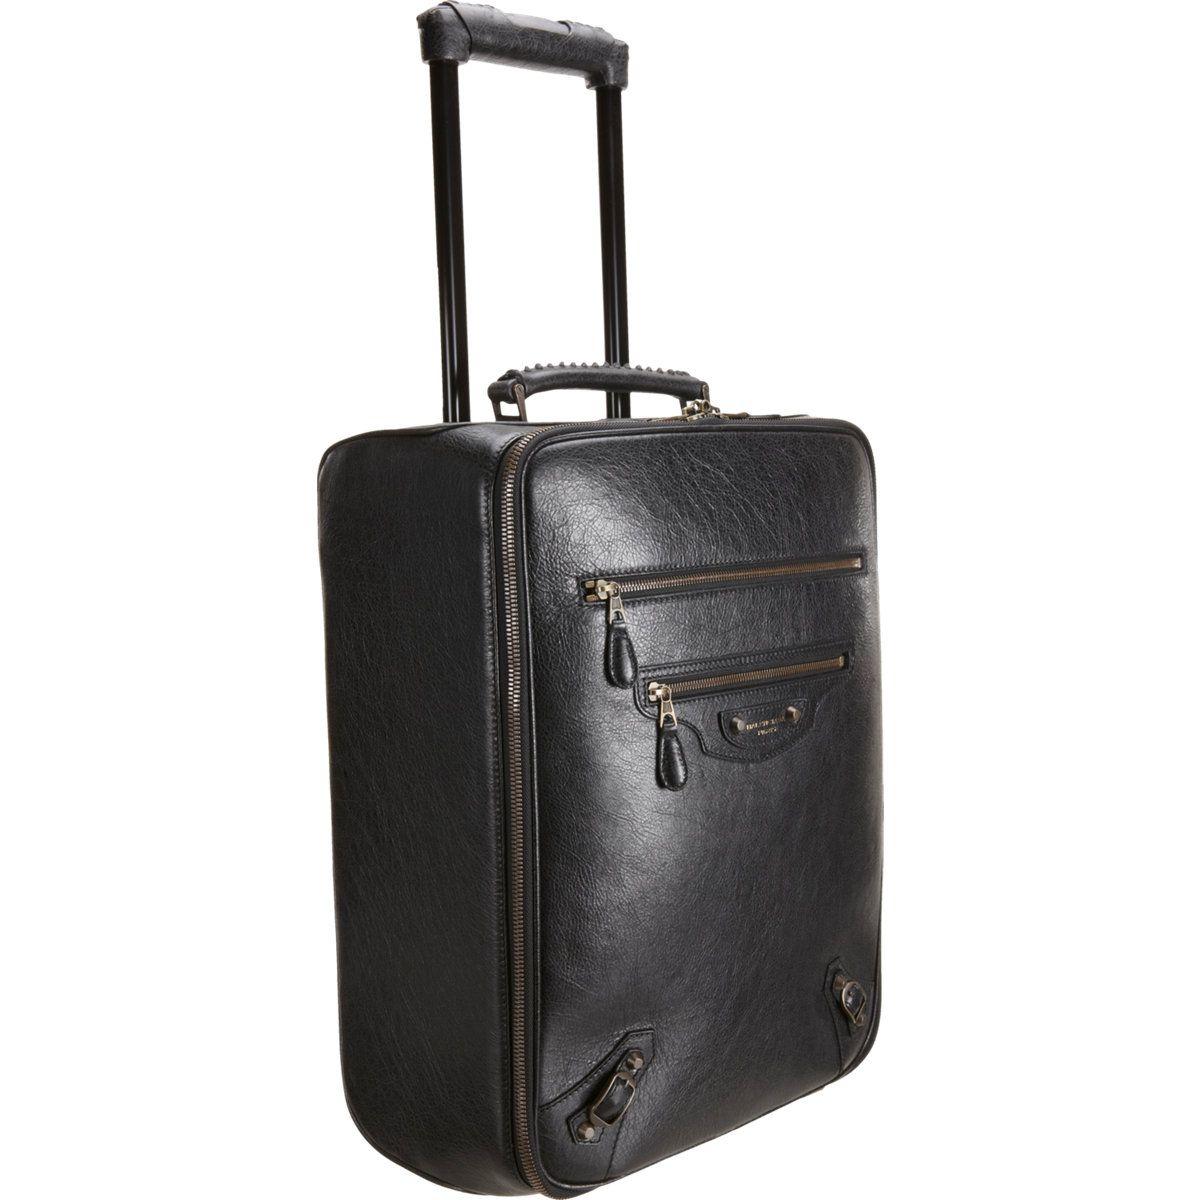 Balenciaga Voyage Carry On Trolley in Black  2780d356576ea